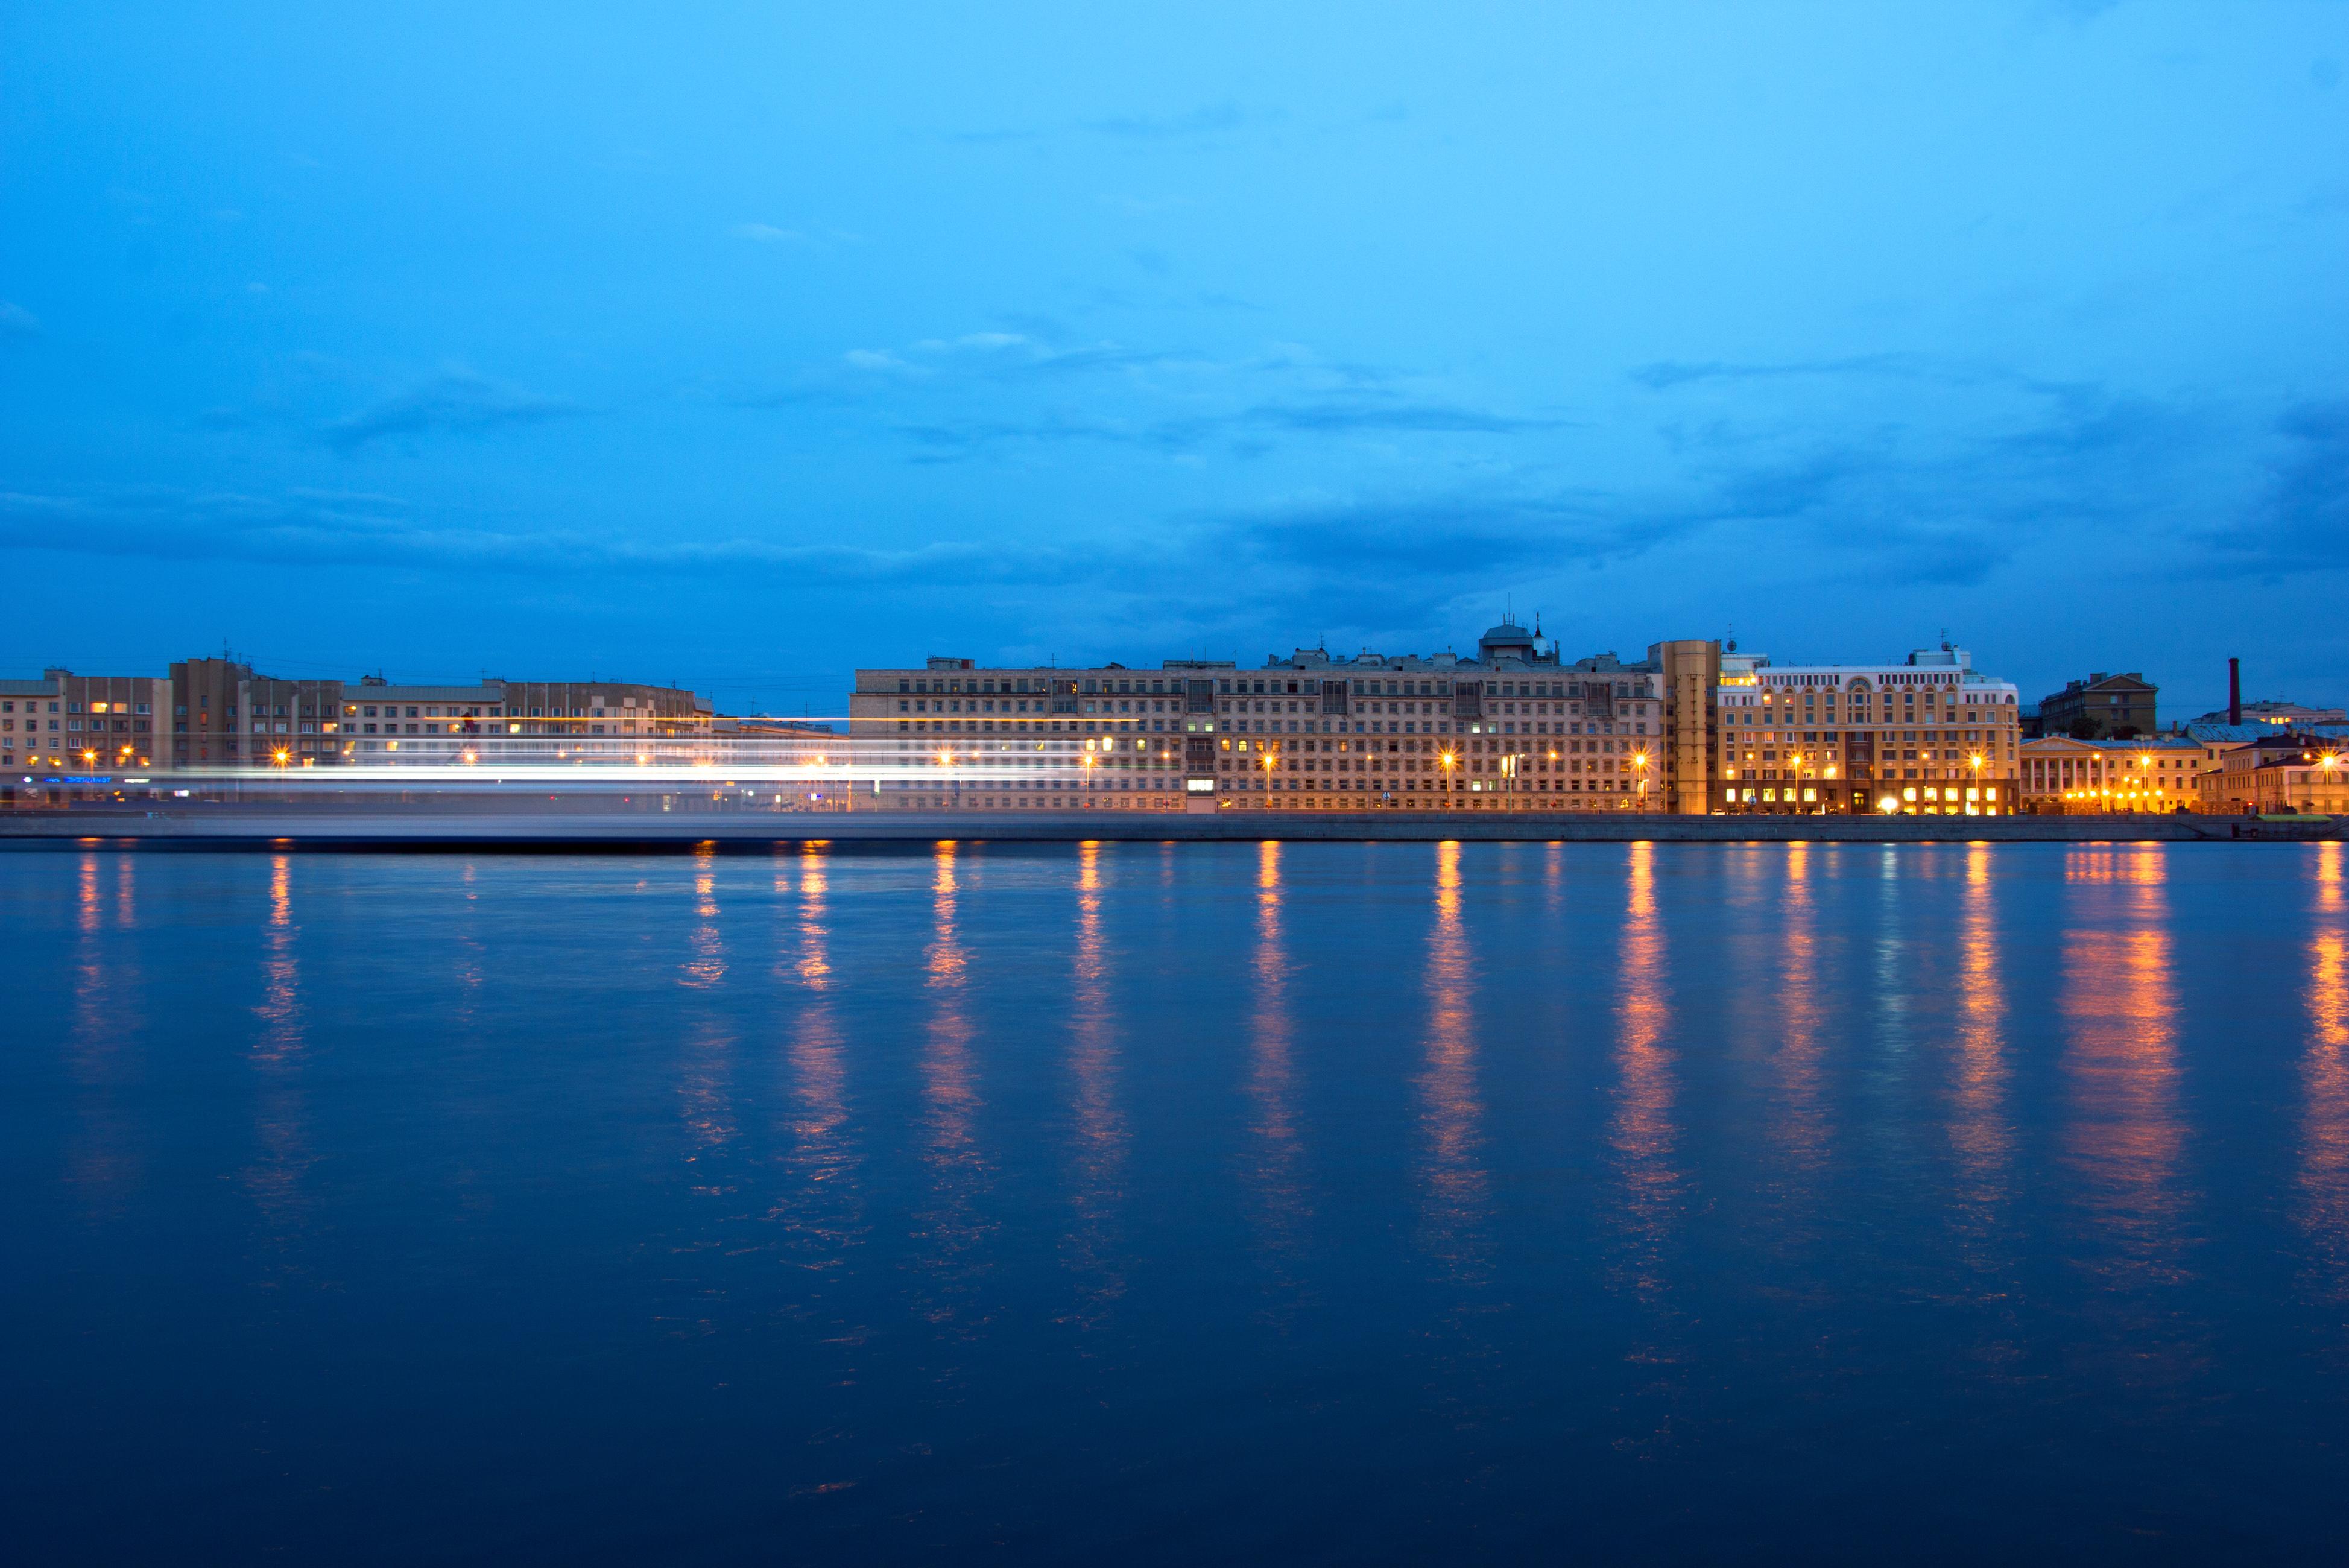 boat's light, Architectural, Scenic, Russian, Saint-petersburg, HQ Photo